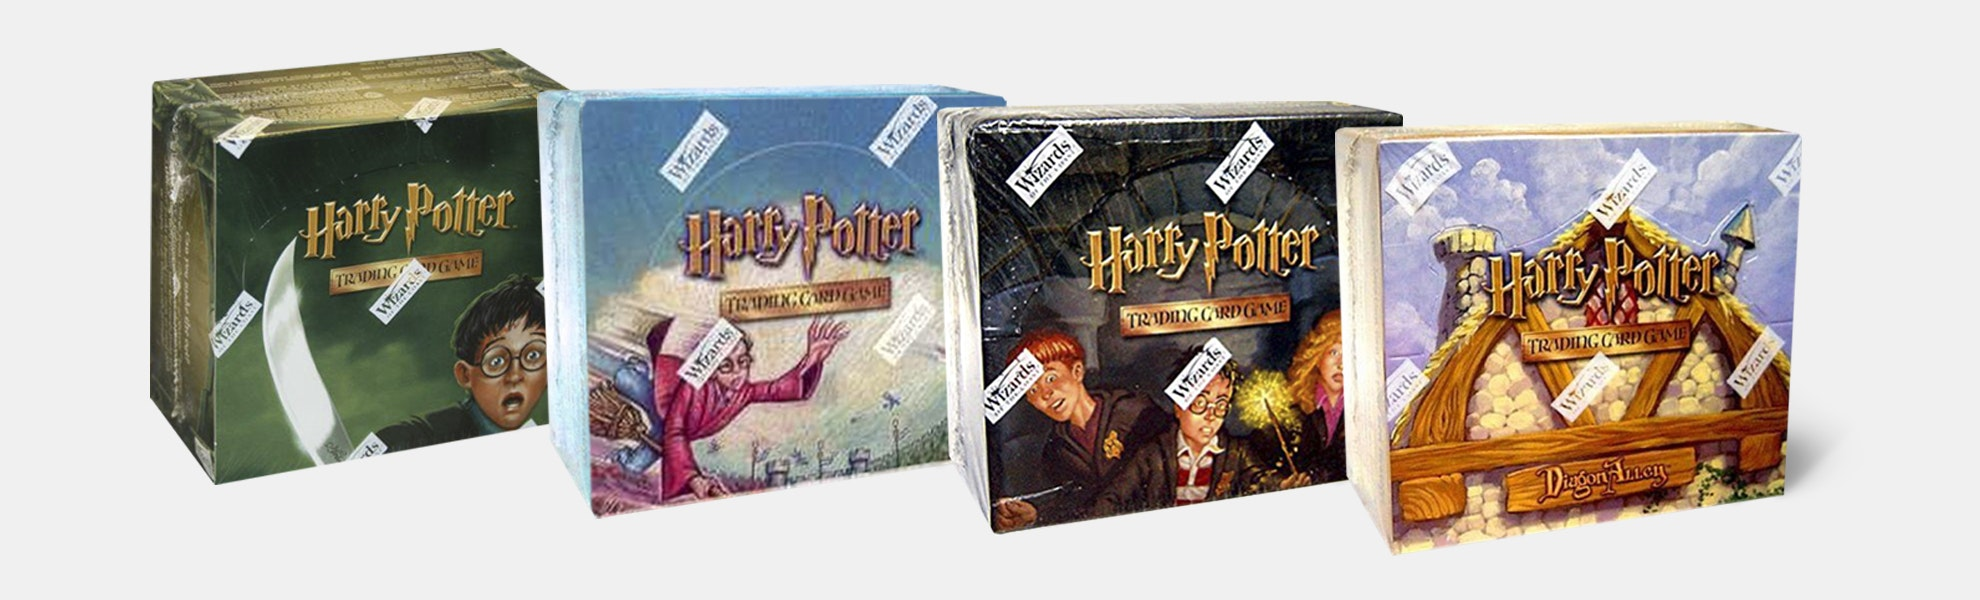 Harry Potter CCG Booster Box Bundle